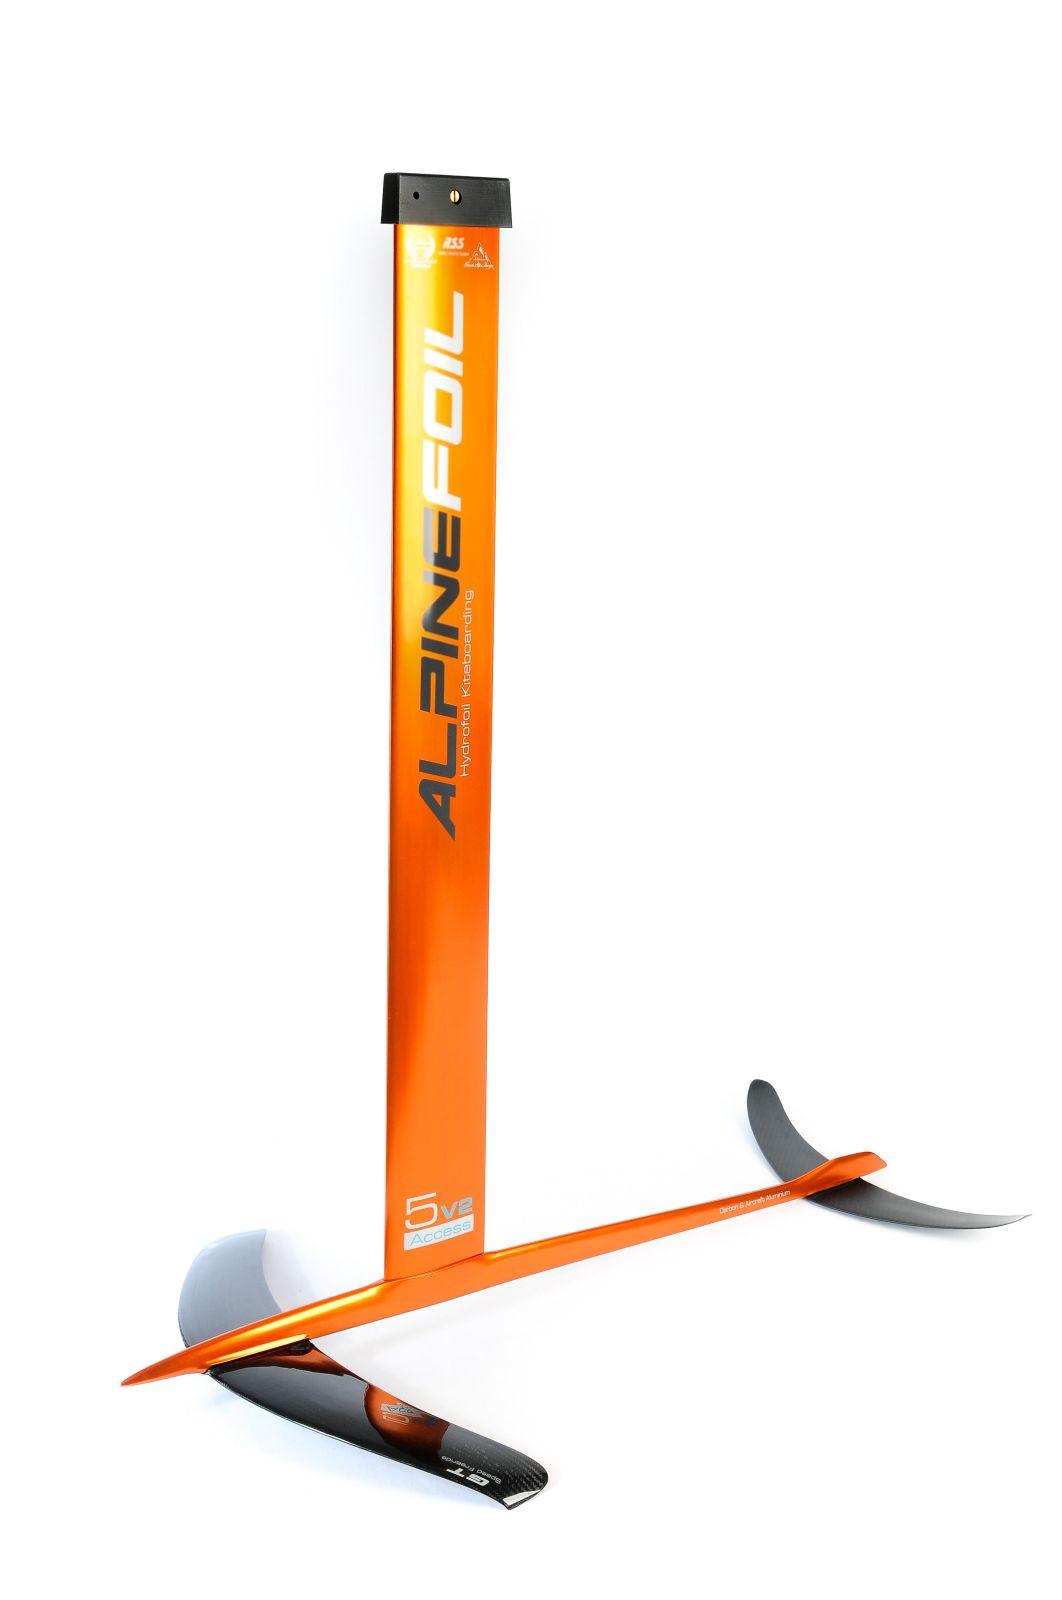 Kitefoil carbon aluminium alpinefoil 5 0 access v2 2490 1